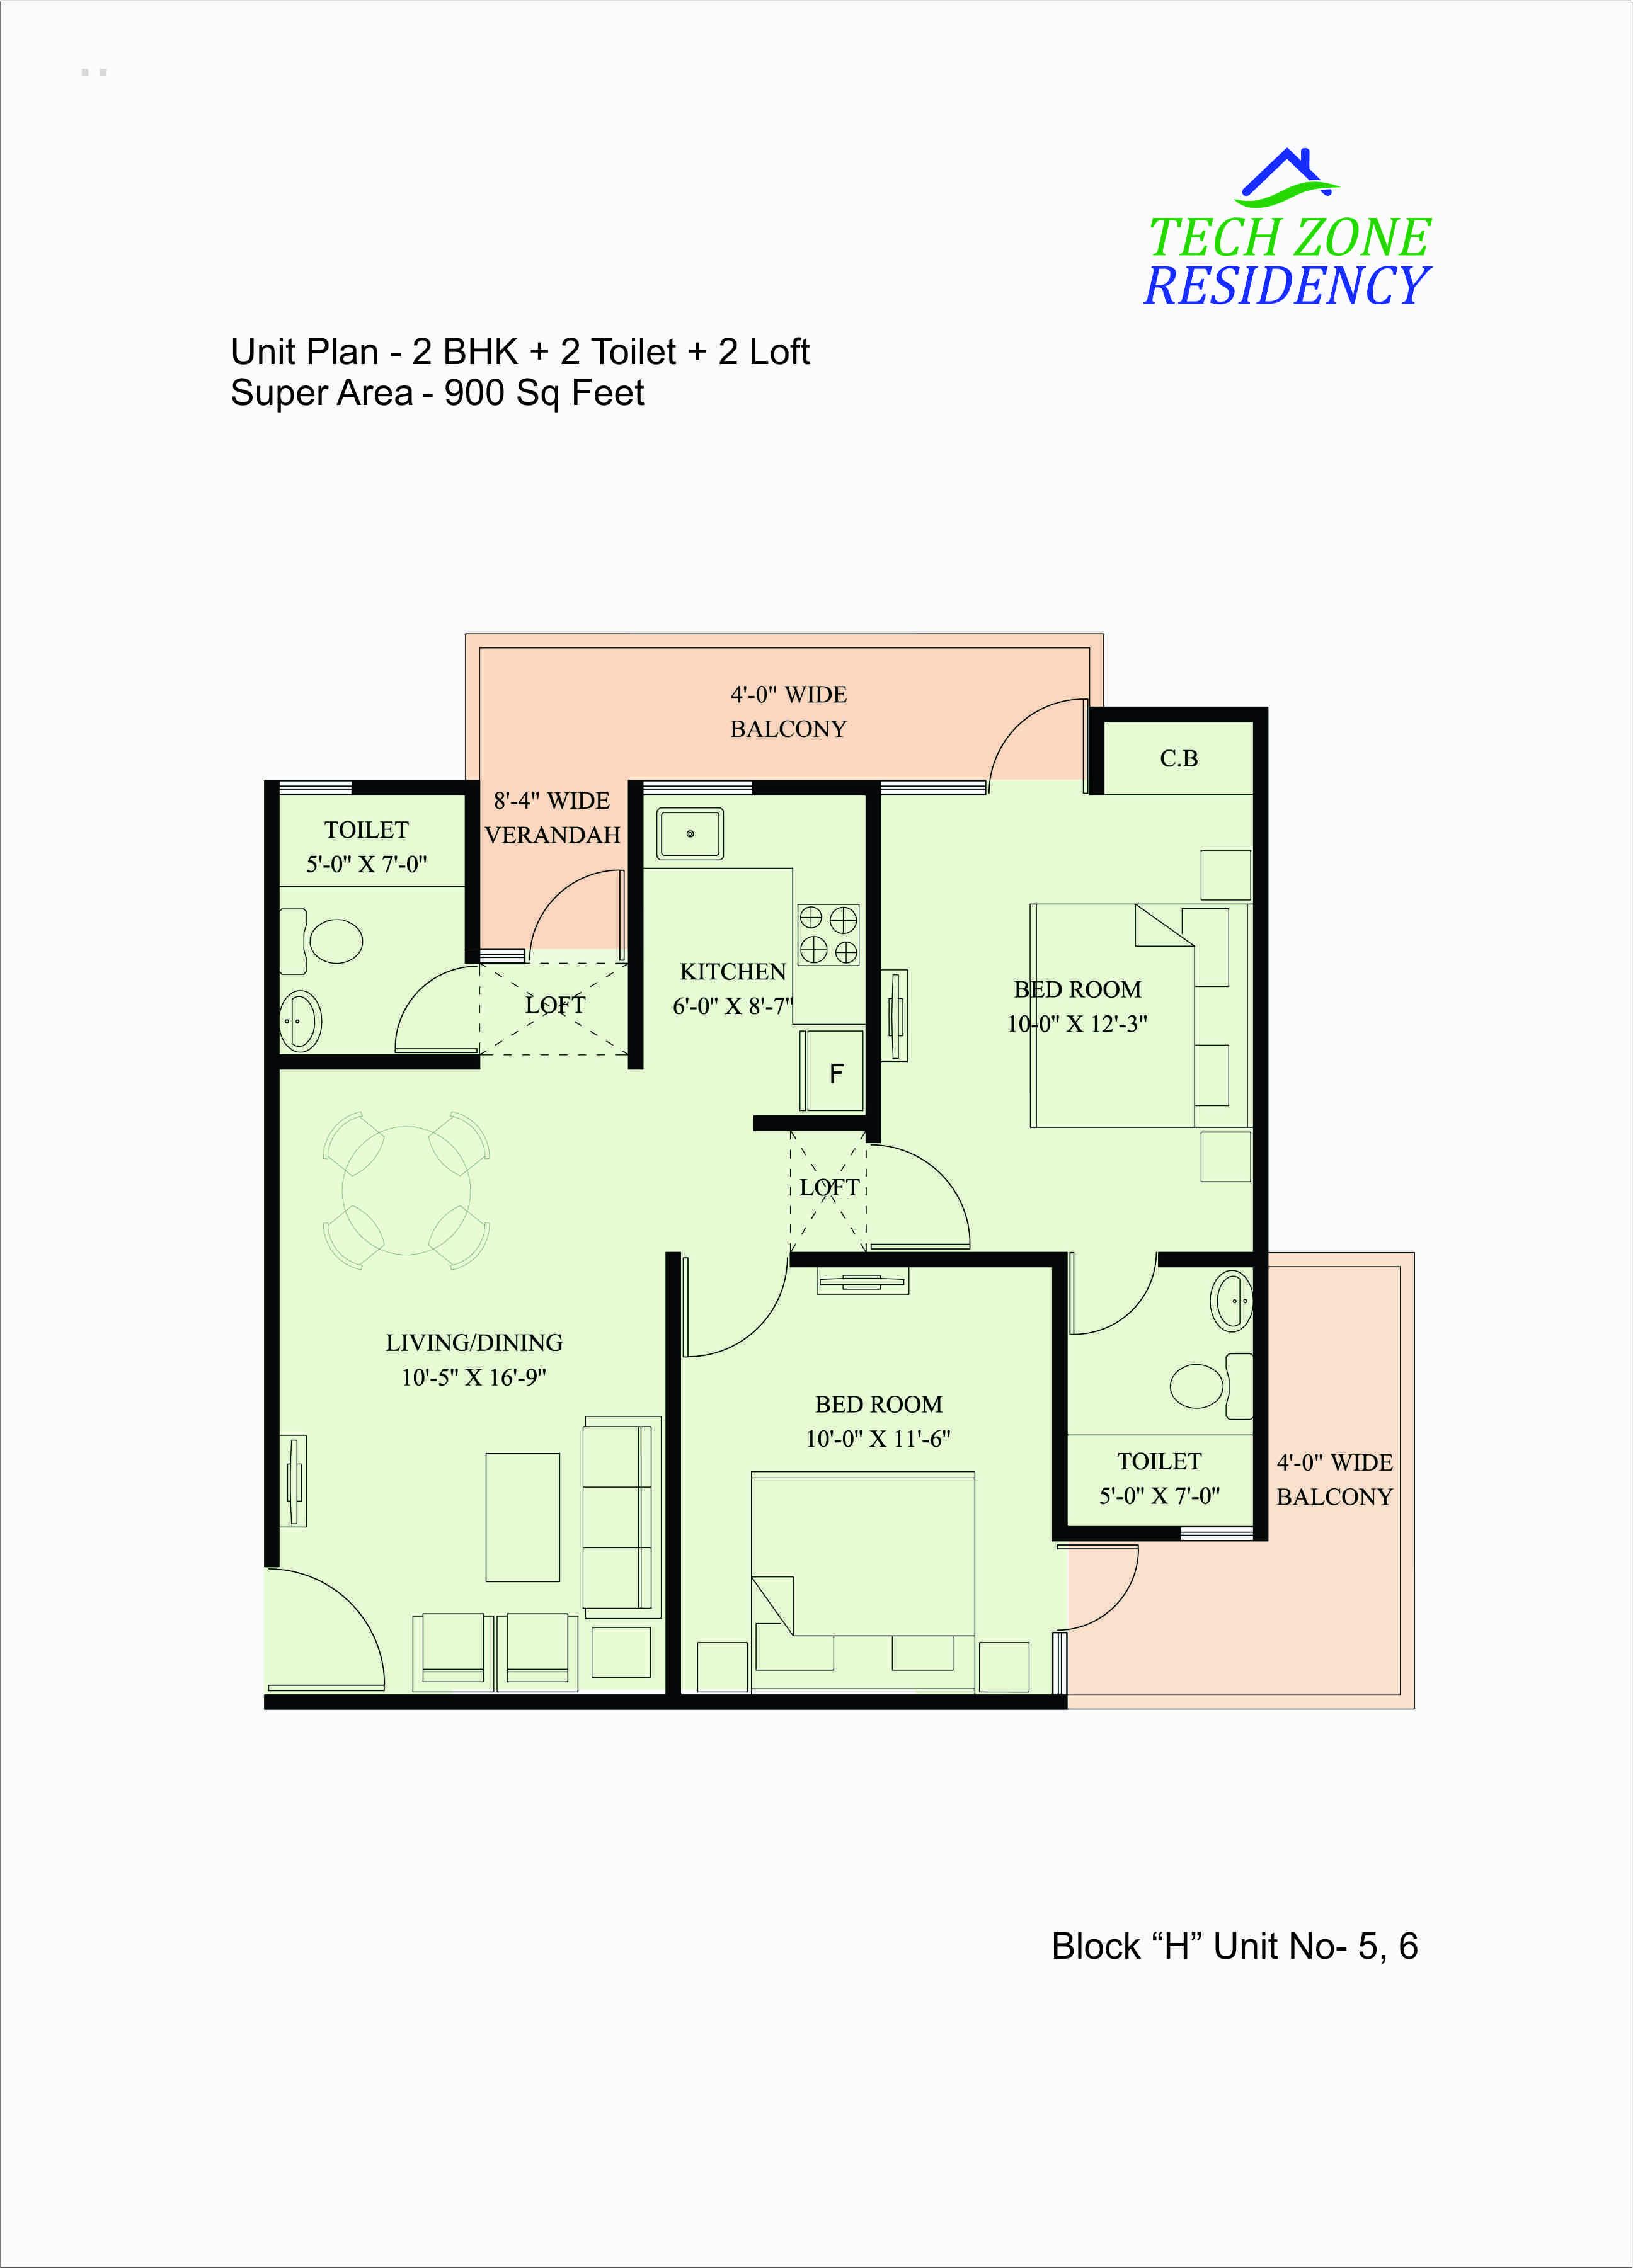 Floor plan tech zone residency 1 2 bhk flats in for X2 residency floor plan